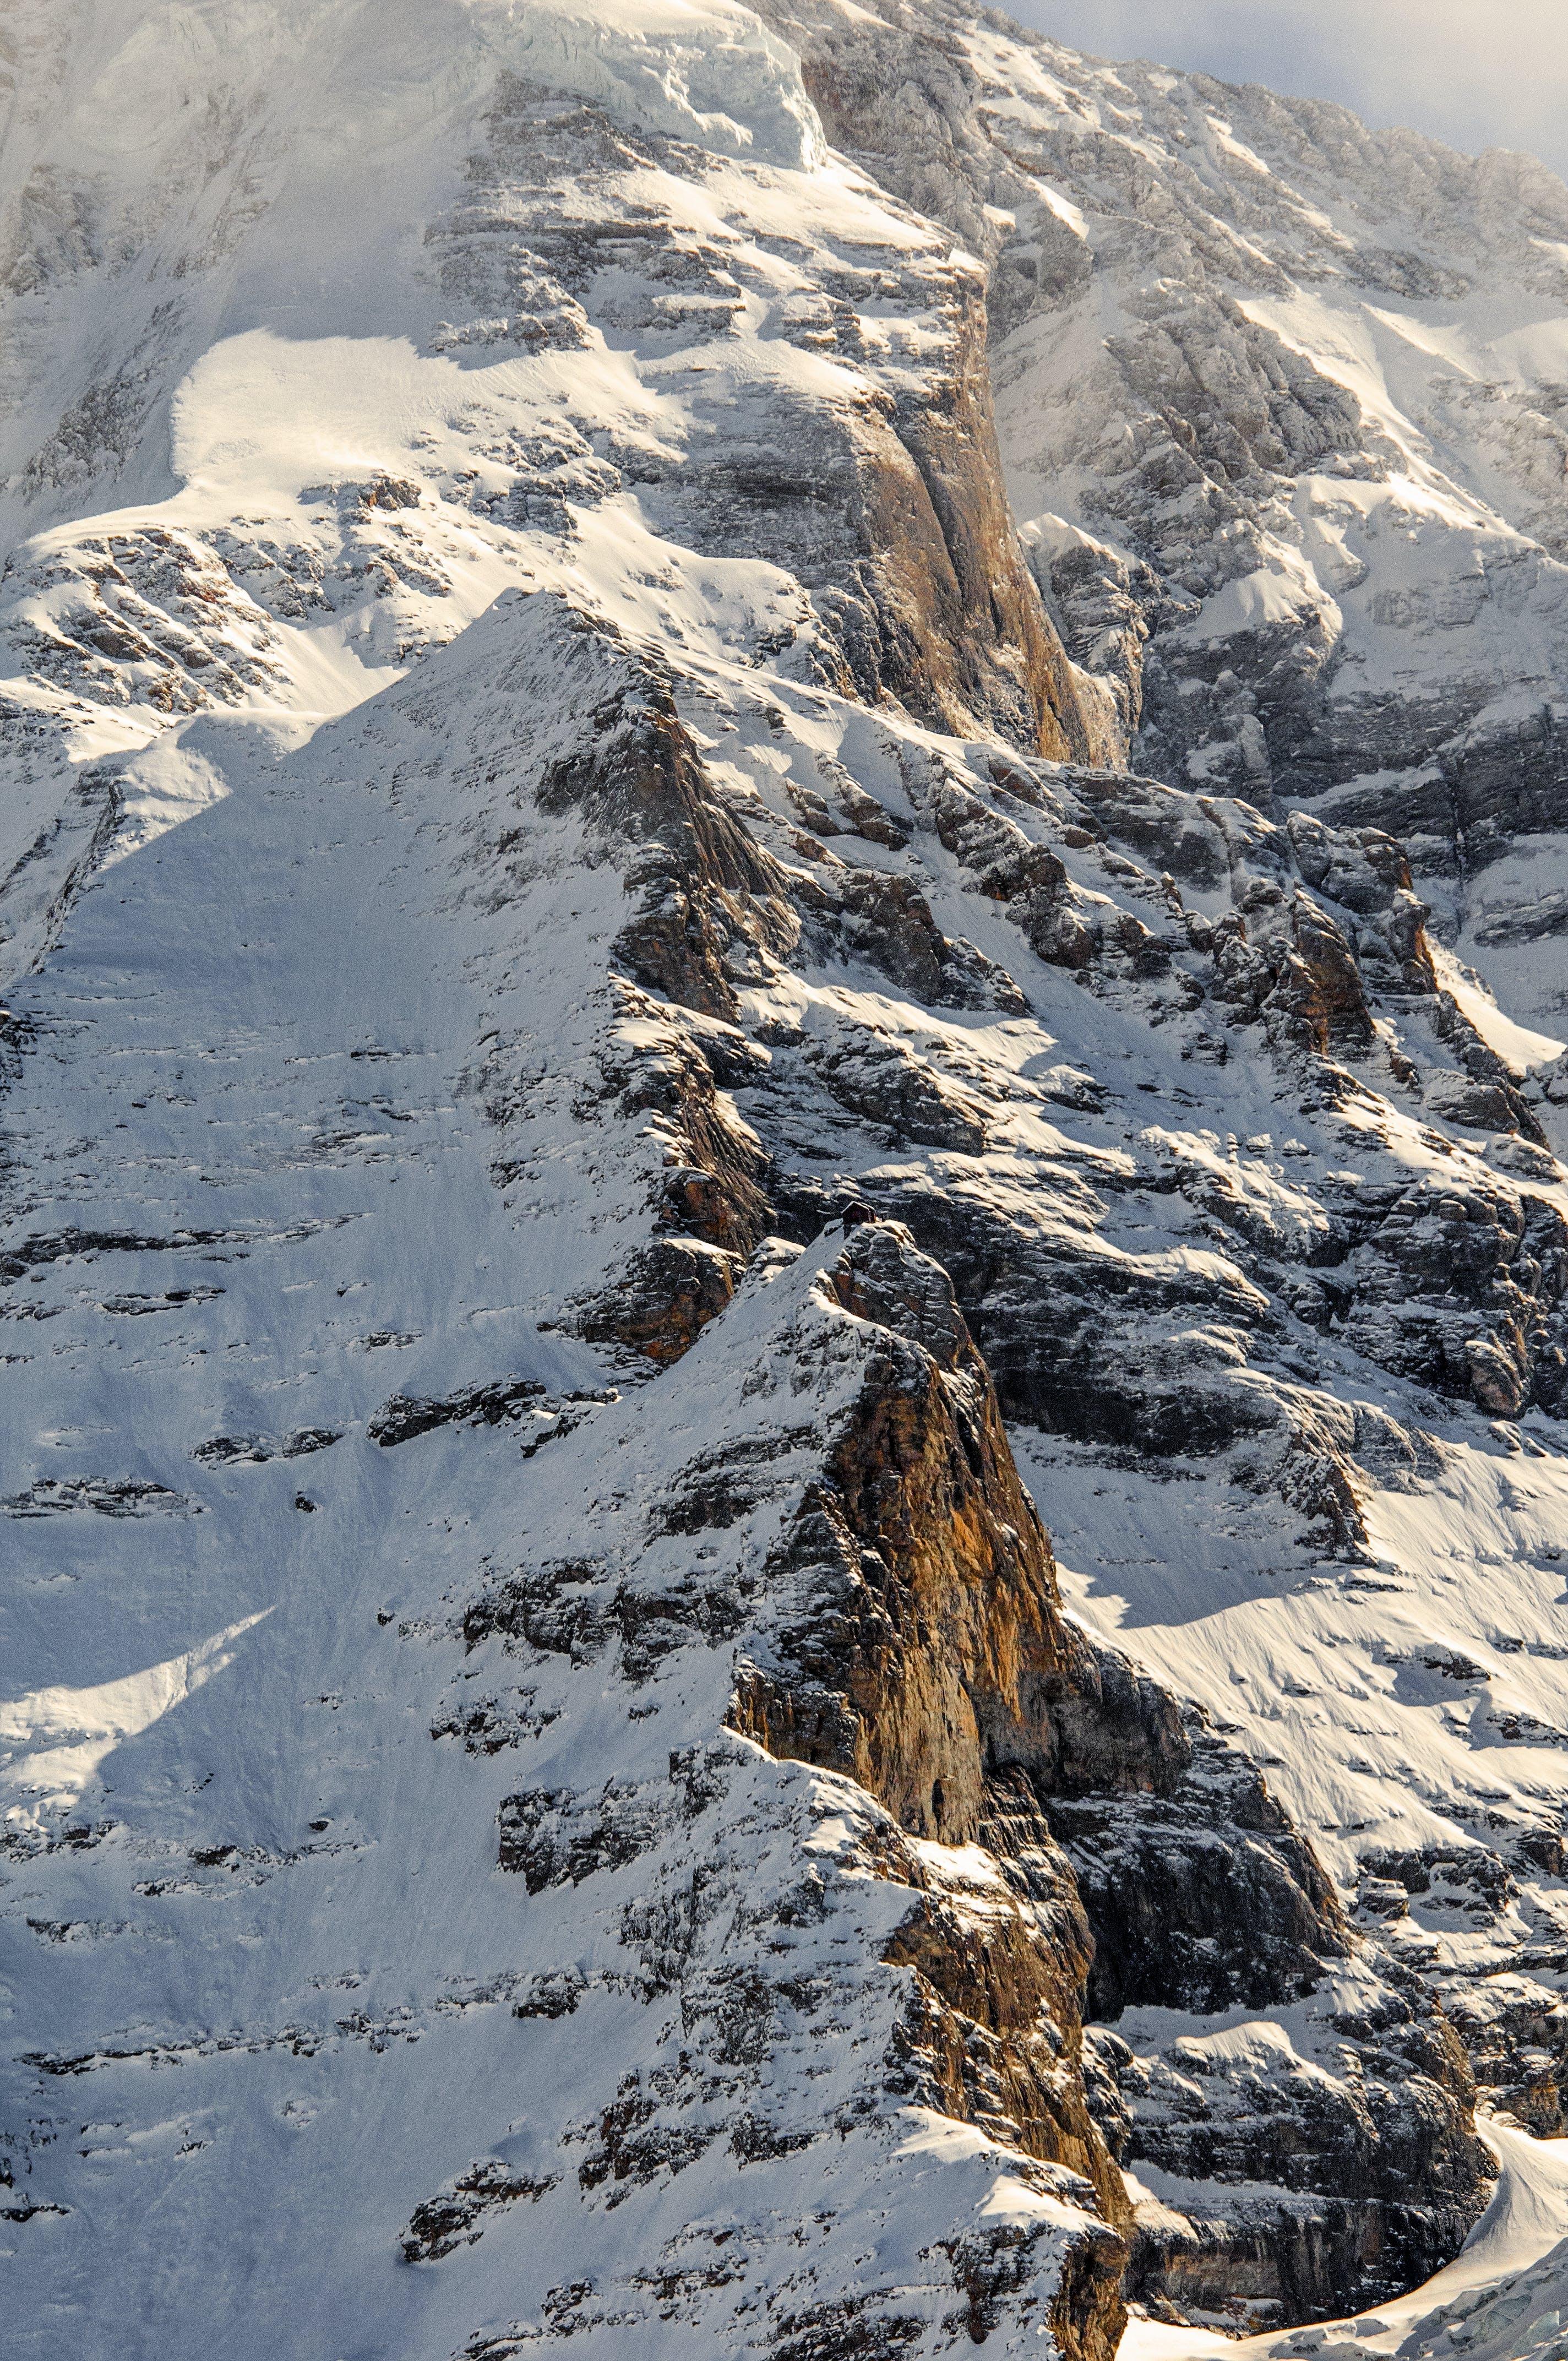 Scenic View of Snowy Mountain Range